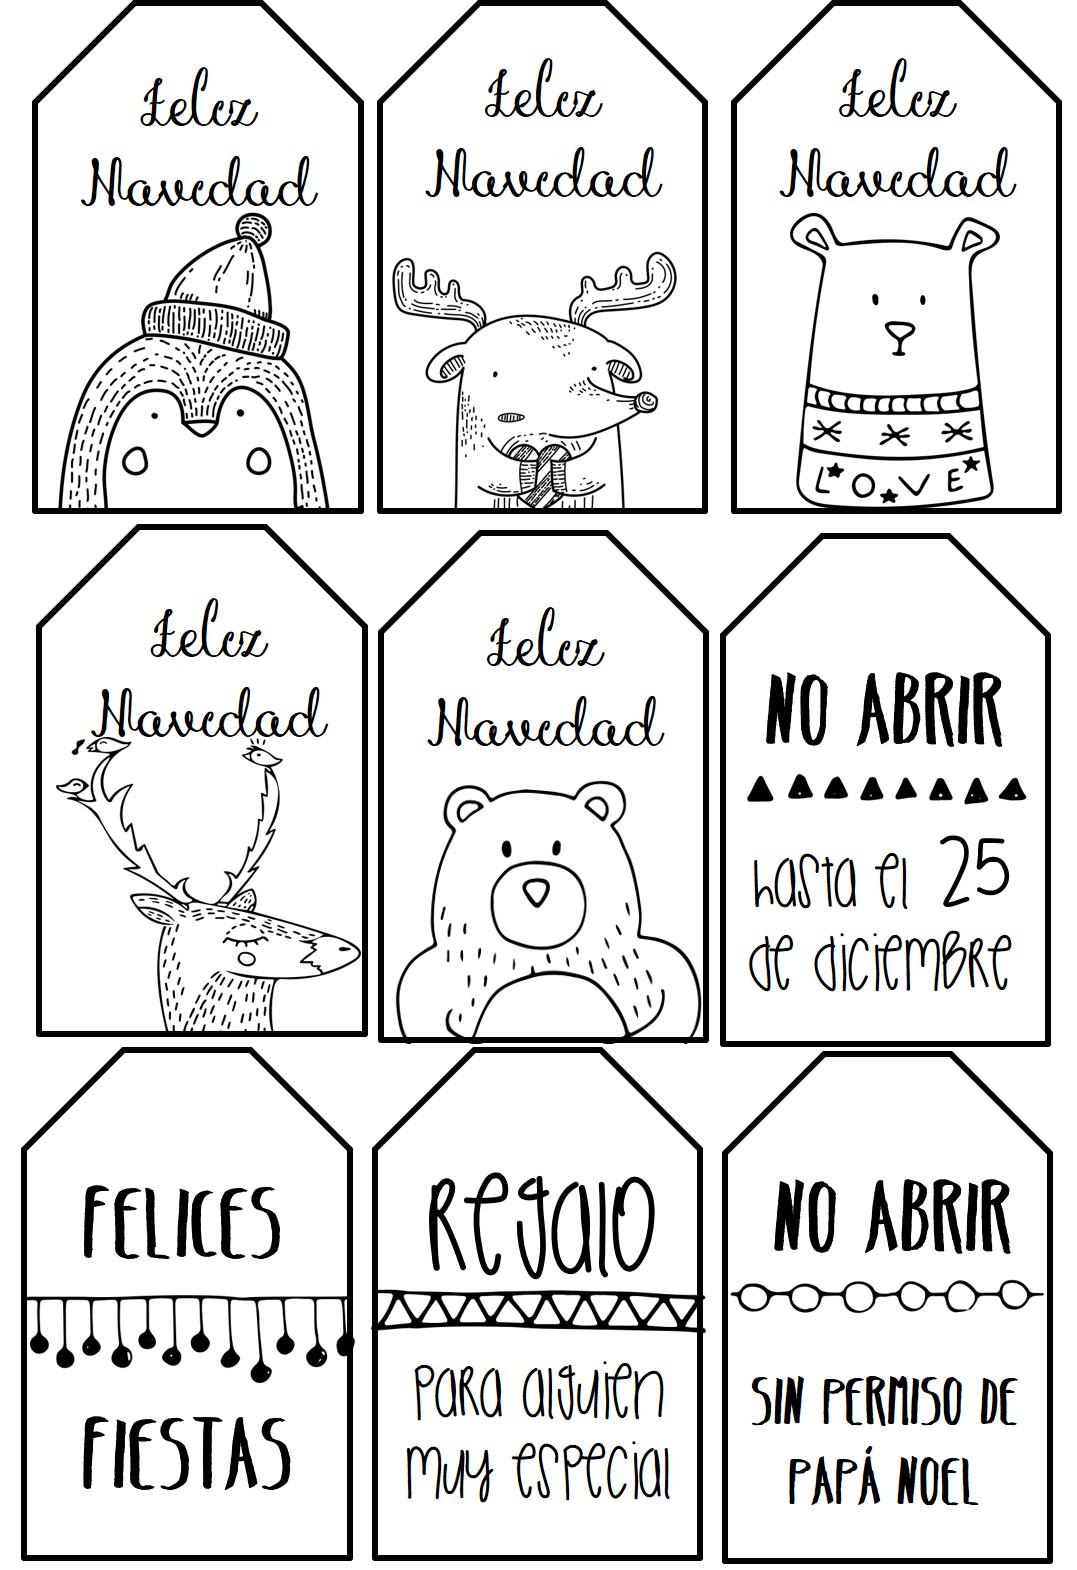 Tarjetas Para Regalos De Navidad. Cajita Tarjeta Explosiva Navidad ...